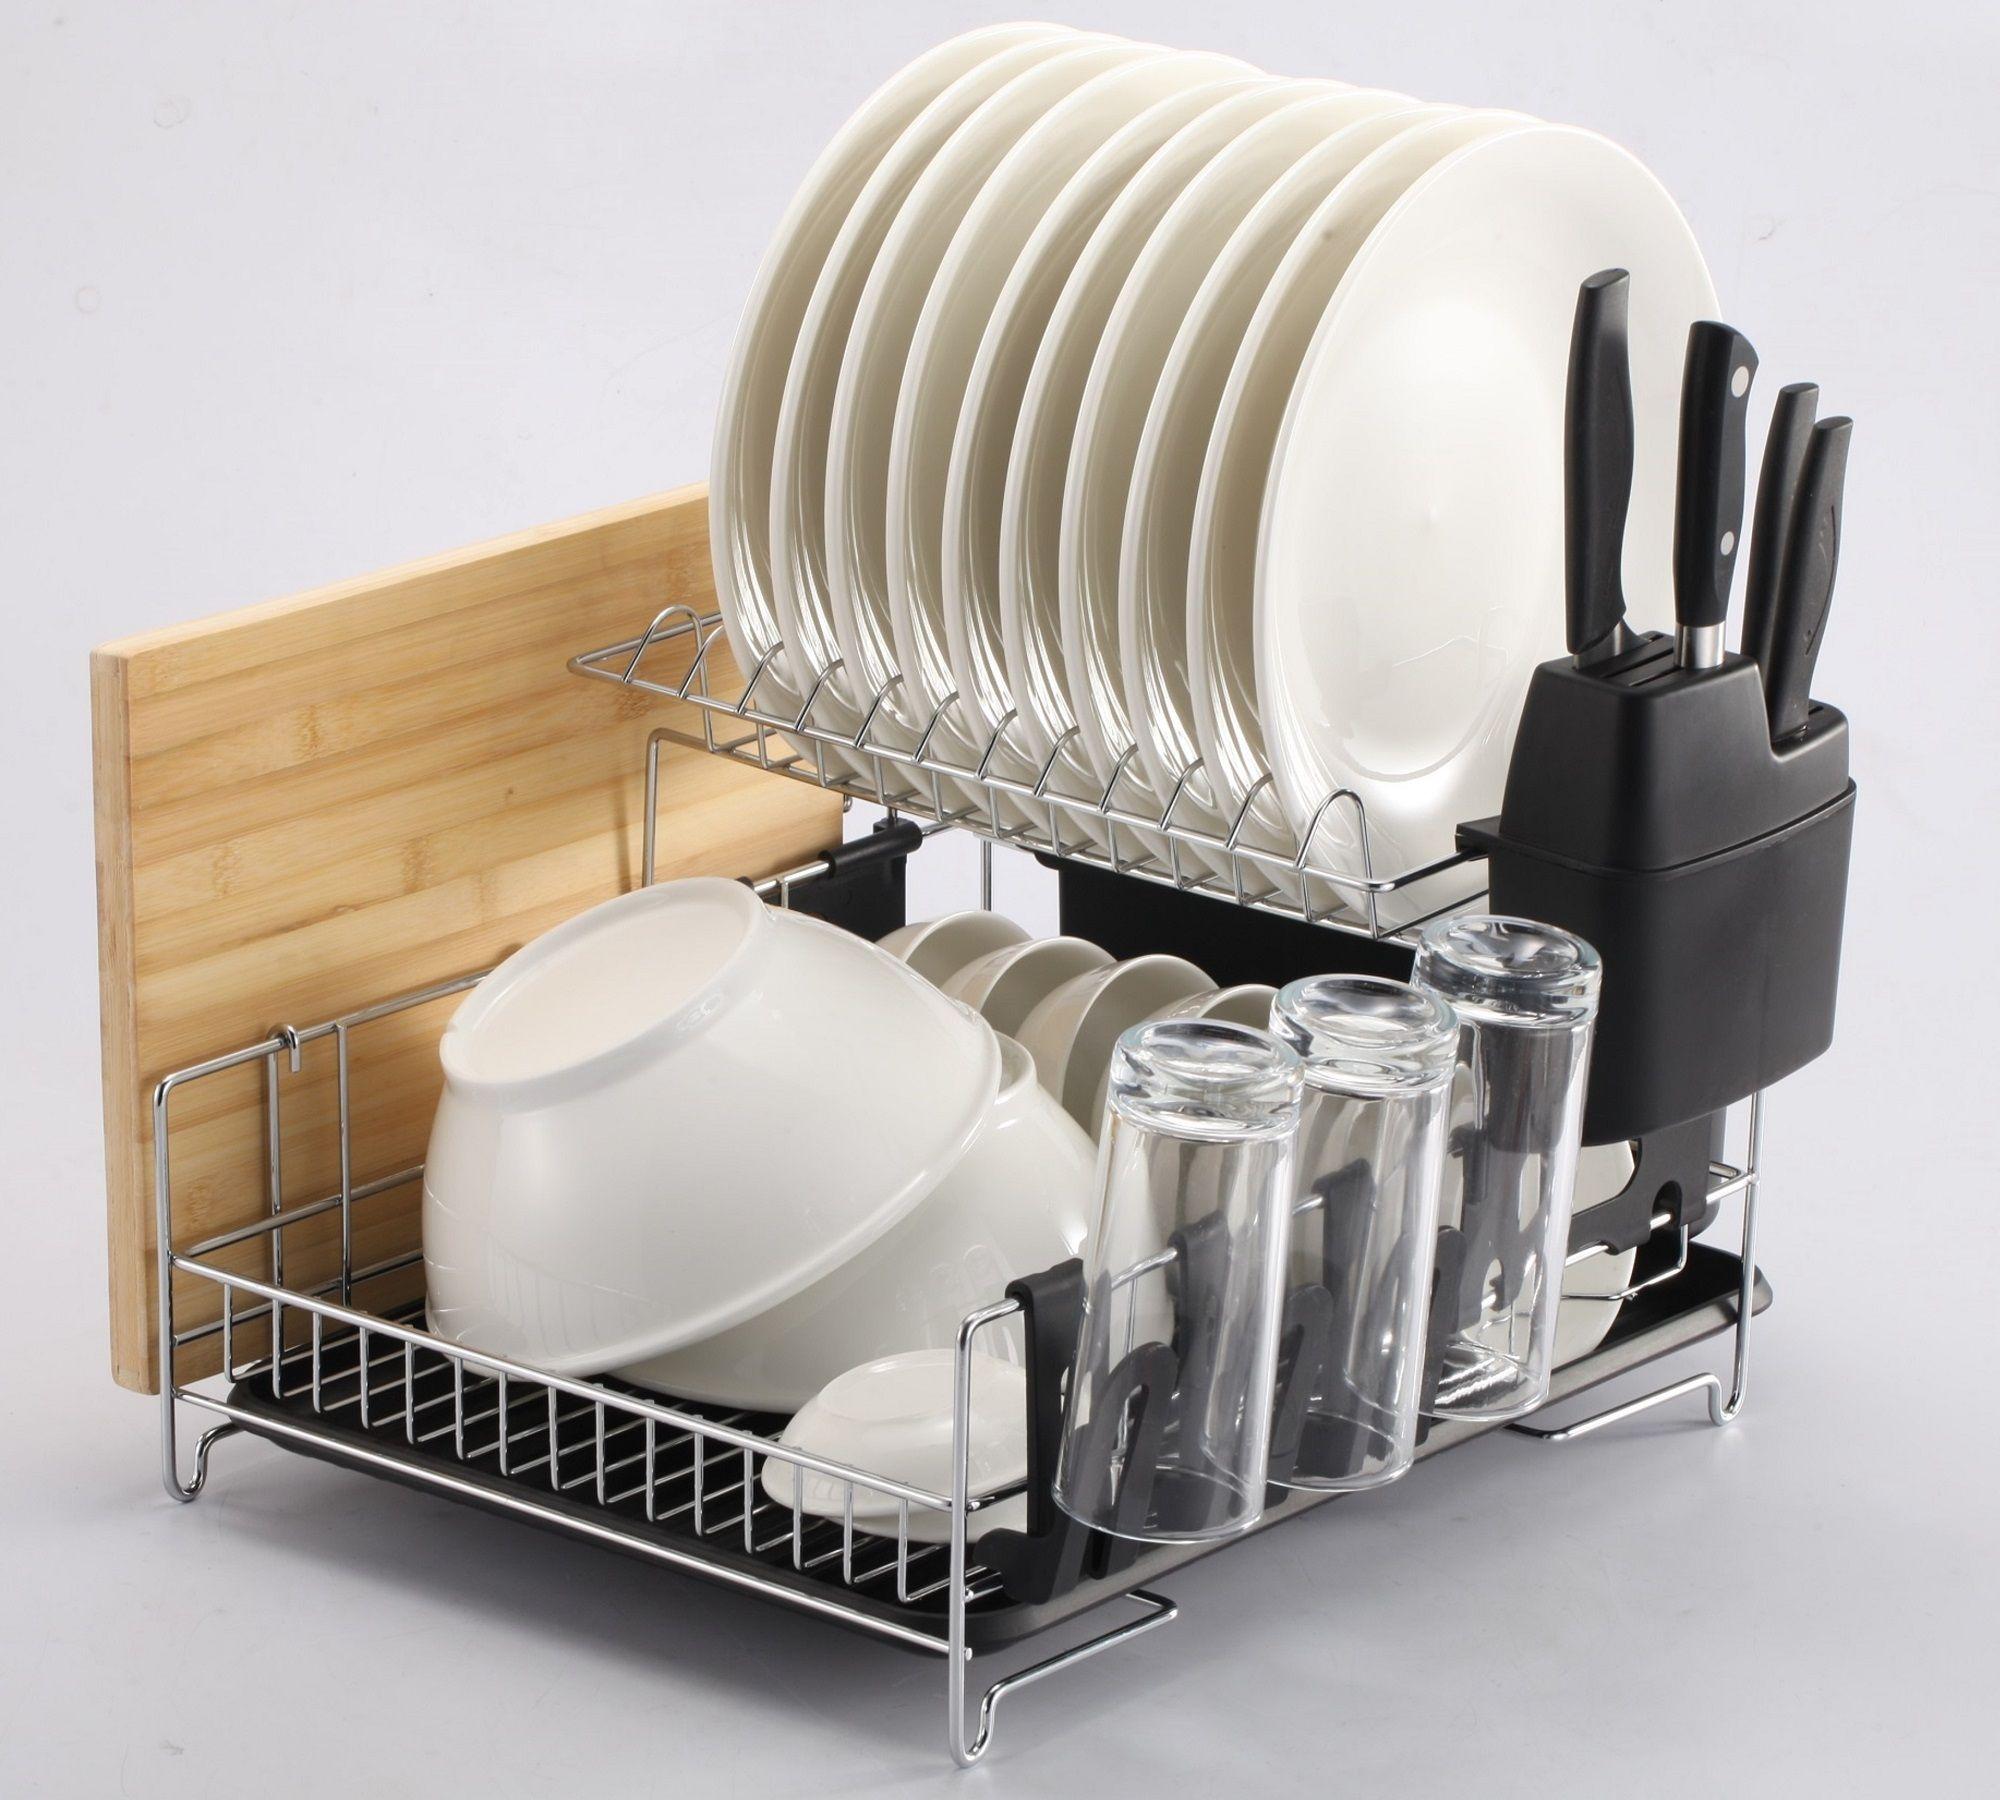 Oxo Good Grips Folding Stainless Steel Dish Rack Prepossessing Fully Customizable Dish Rack Httpwwwamazondpb01Ft7J7Yi Design Decoration